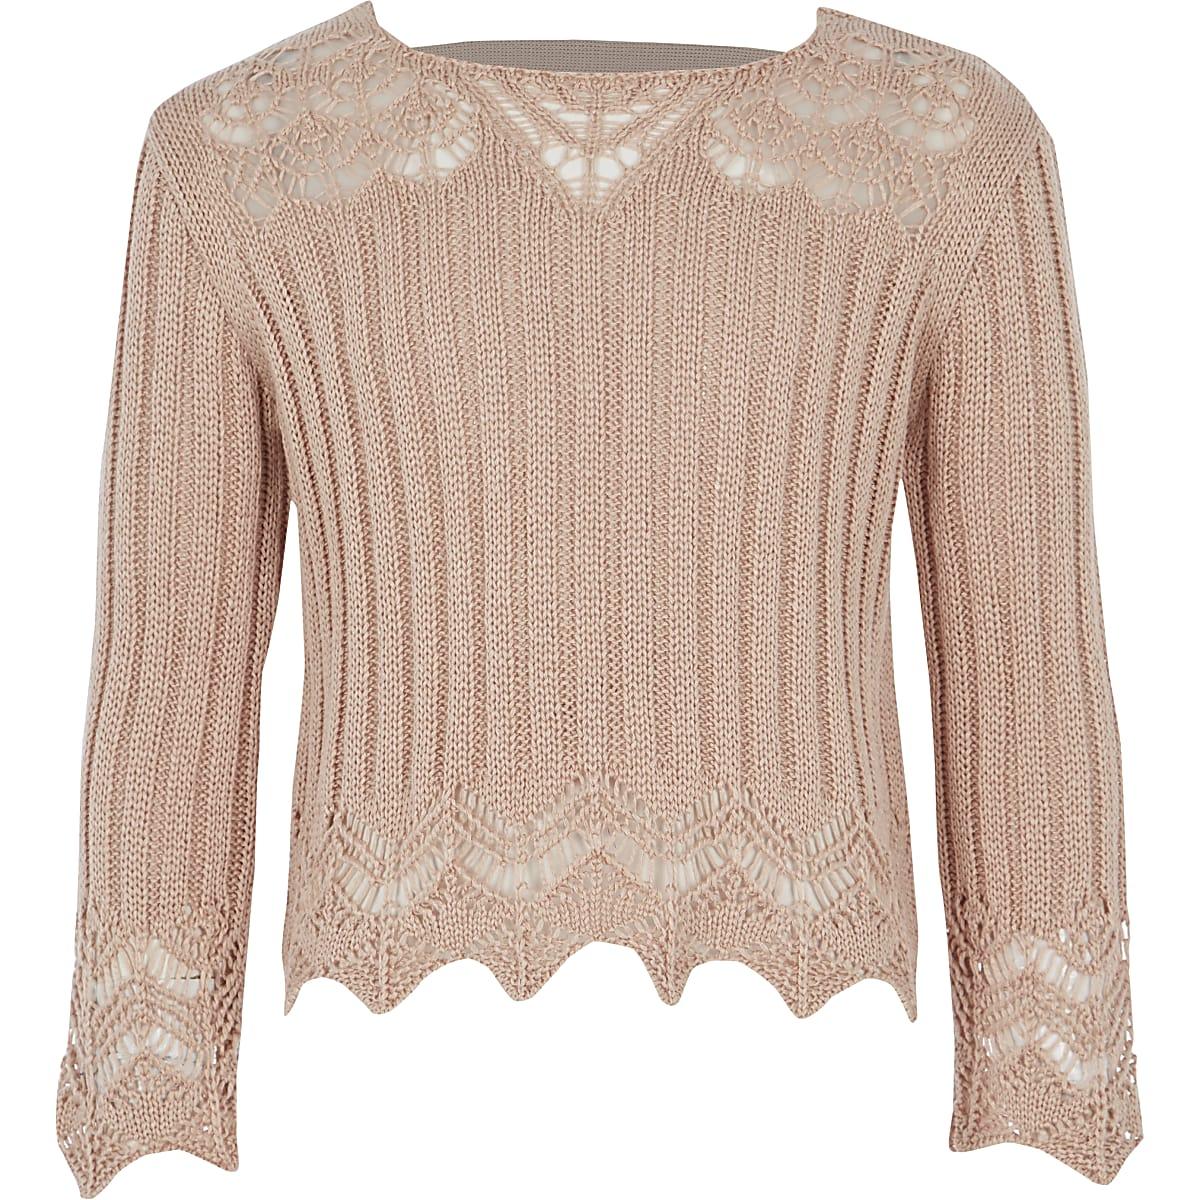 Girls pink crotchet wide sleeve top